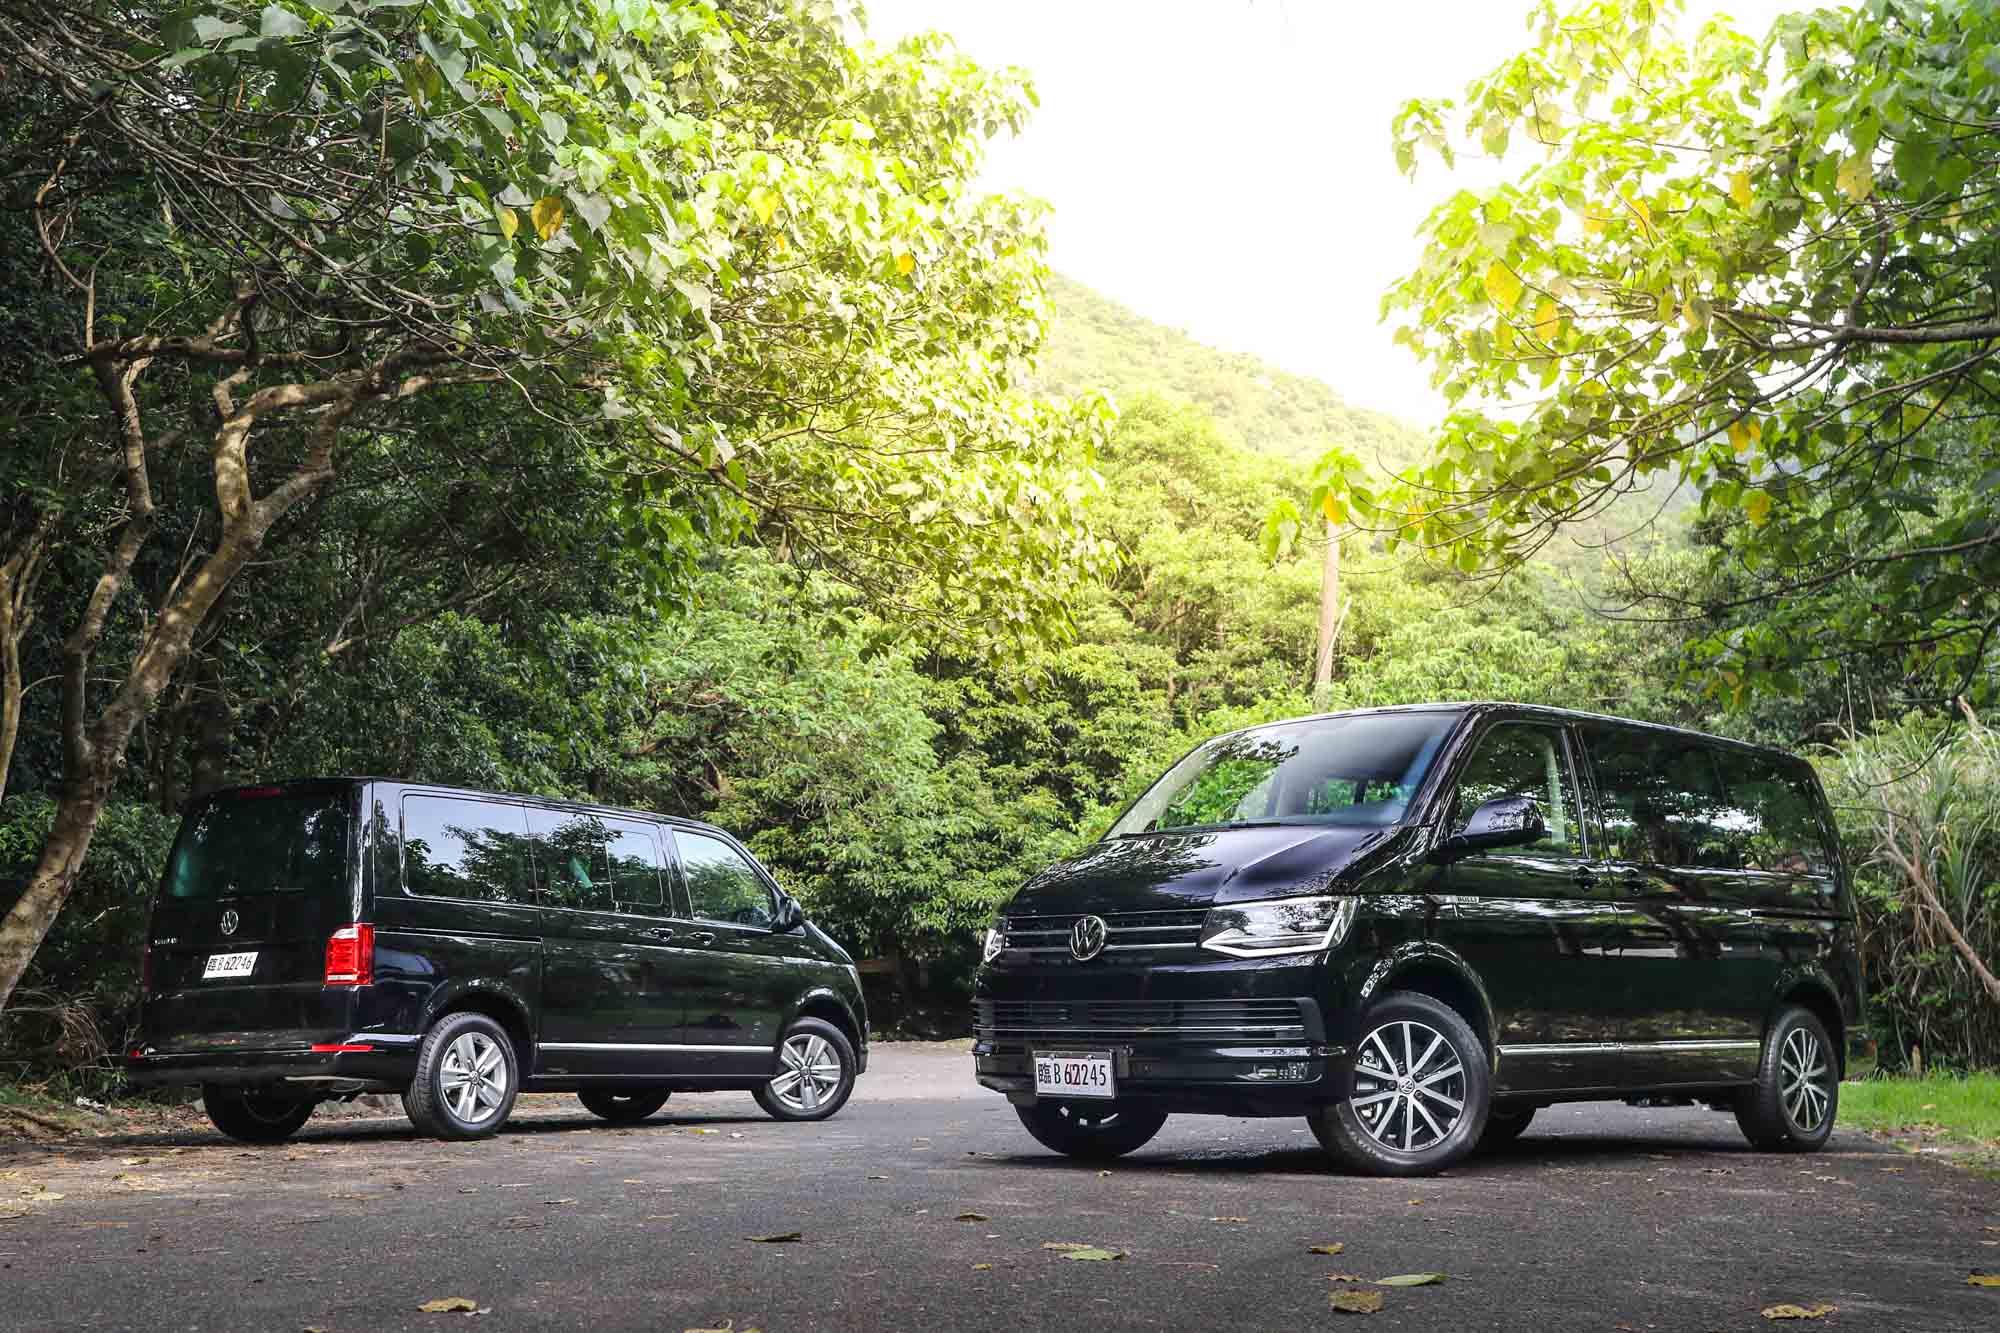 2019年式Multivan提供三種等級車型,售價分別為Multivan Comfortline:225.8萬、Multivan Highline:269.8萬、Multivan Highline 4WD:289.8萬。